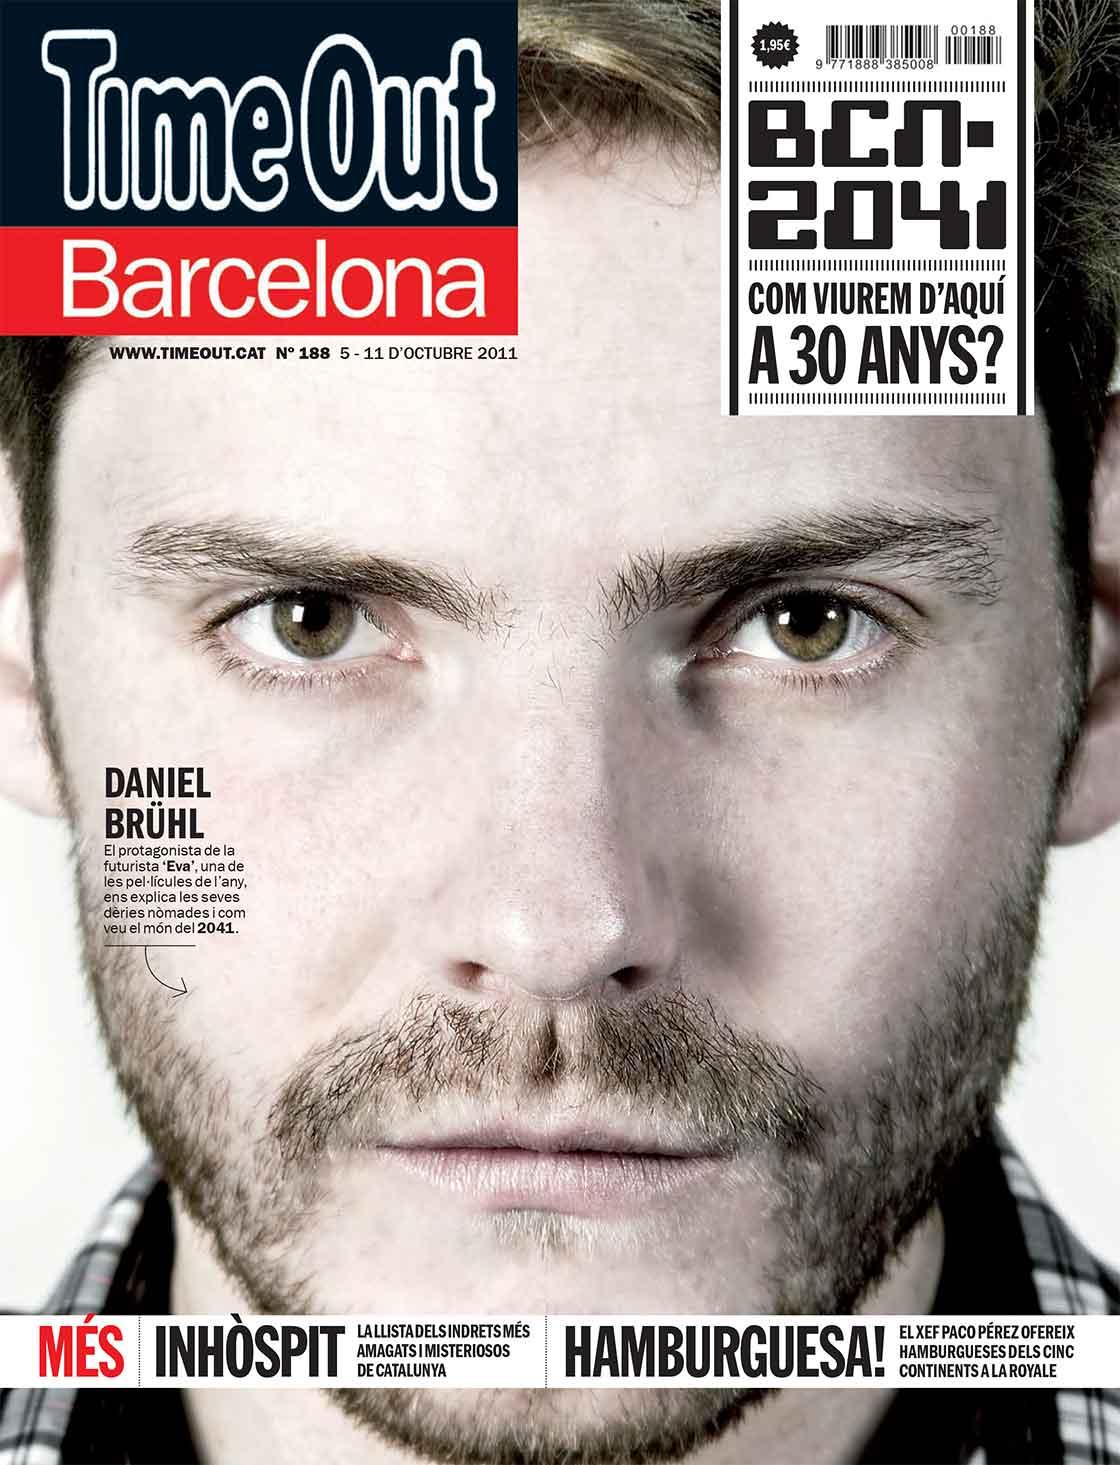 TimeOut Barcelona n.188 - portada @Marc García-Durán, arquitecto